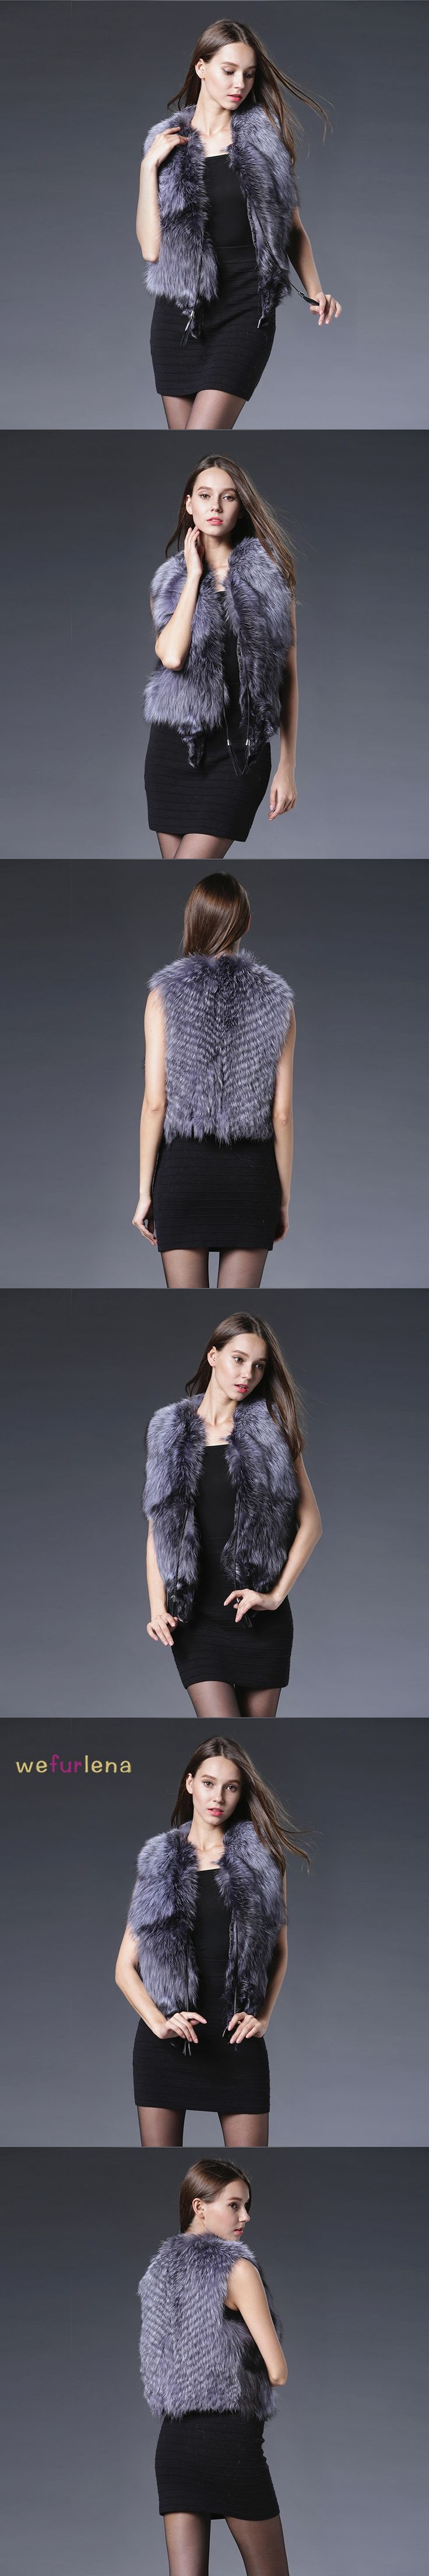 Fashion Natural Fox Fur Vests Women Real Sliver Fox Fur Gilets Genuine Fur Waistcoats Women Luxurious Fox Fur Coat